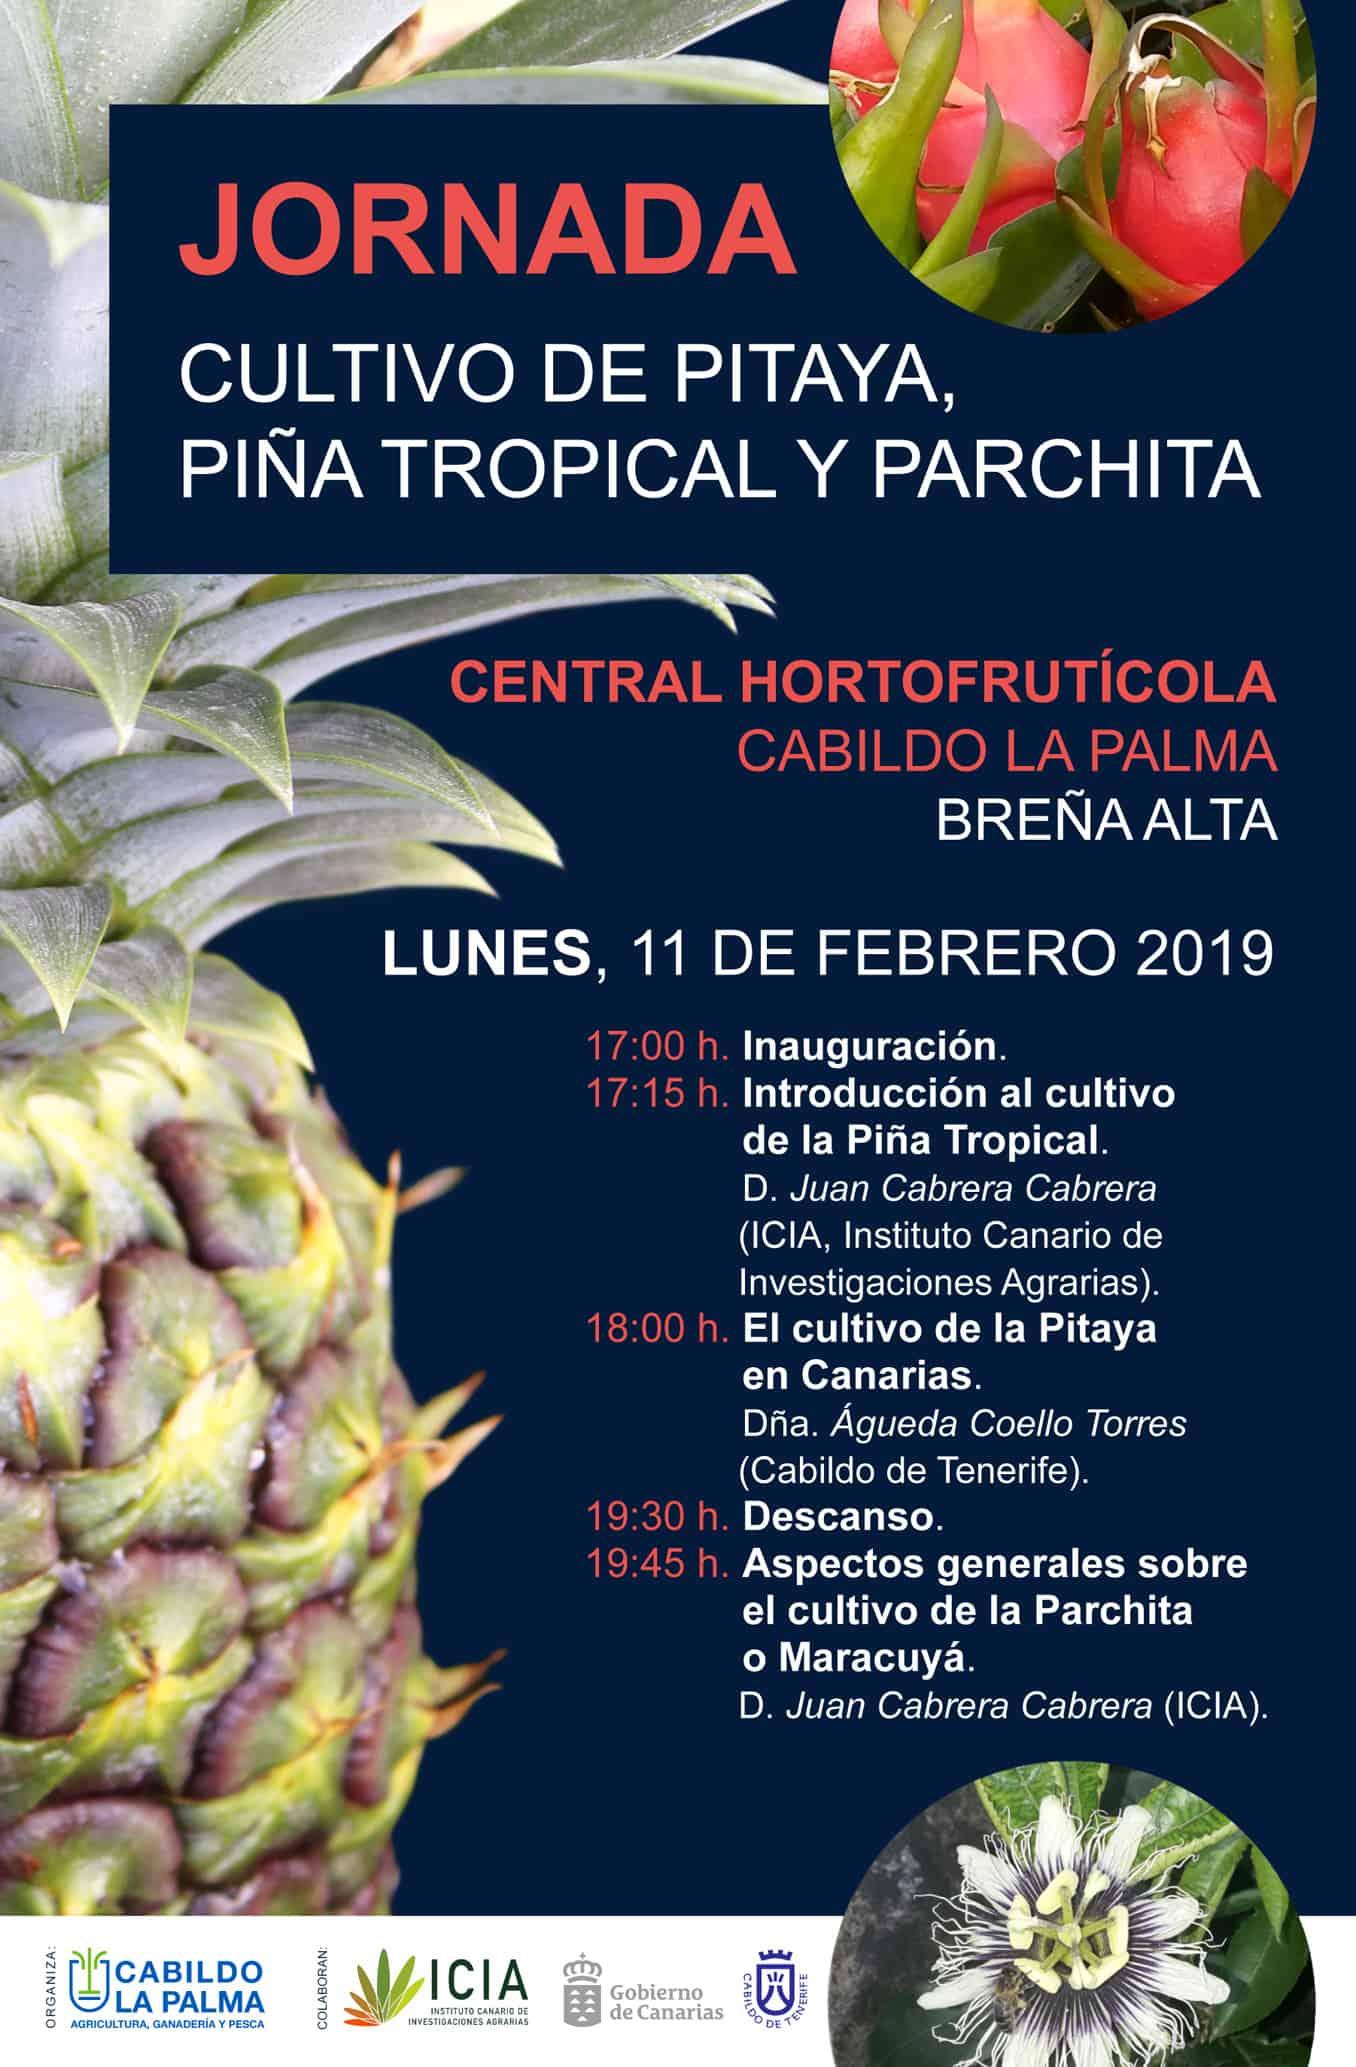 Jornada Cultivo Pitaya, Piña Tropical y Parchita